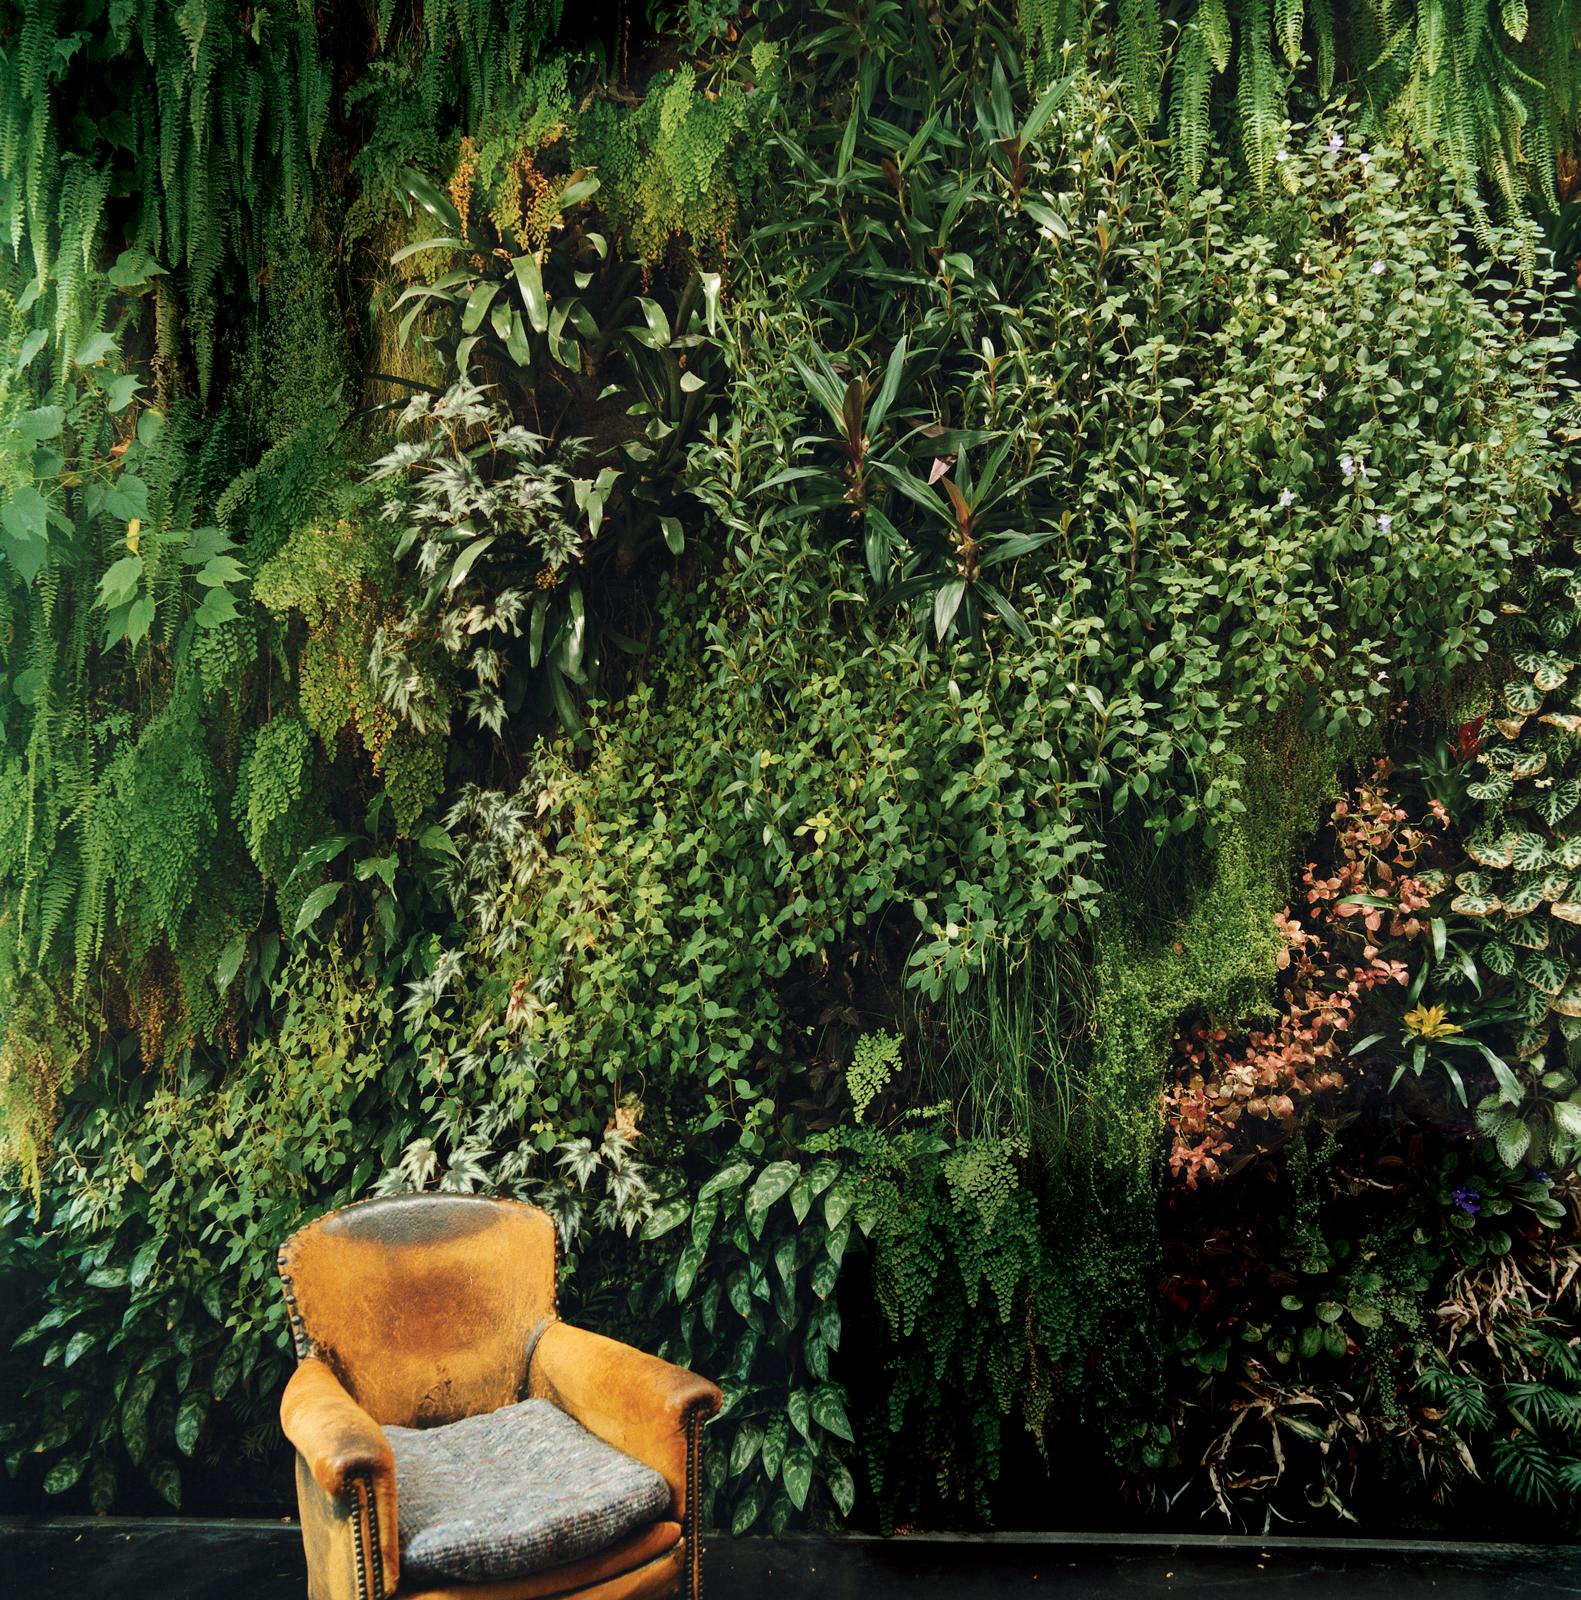 indoor gardens paris france blanc patrick dimanche house wall